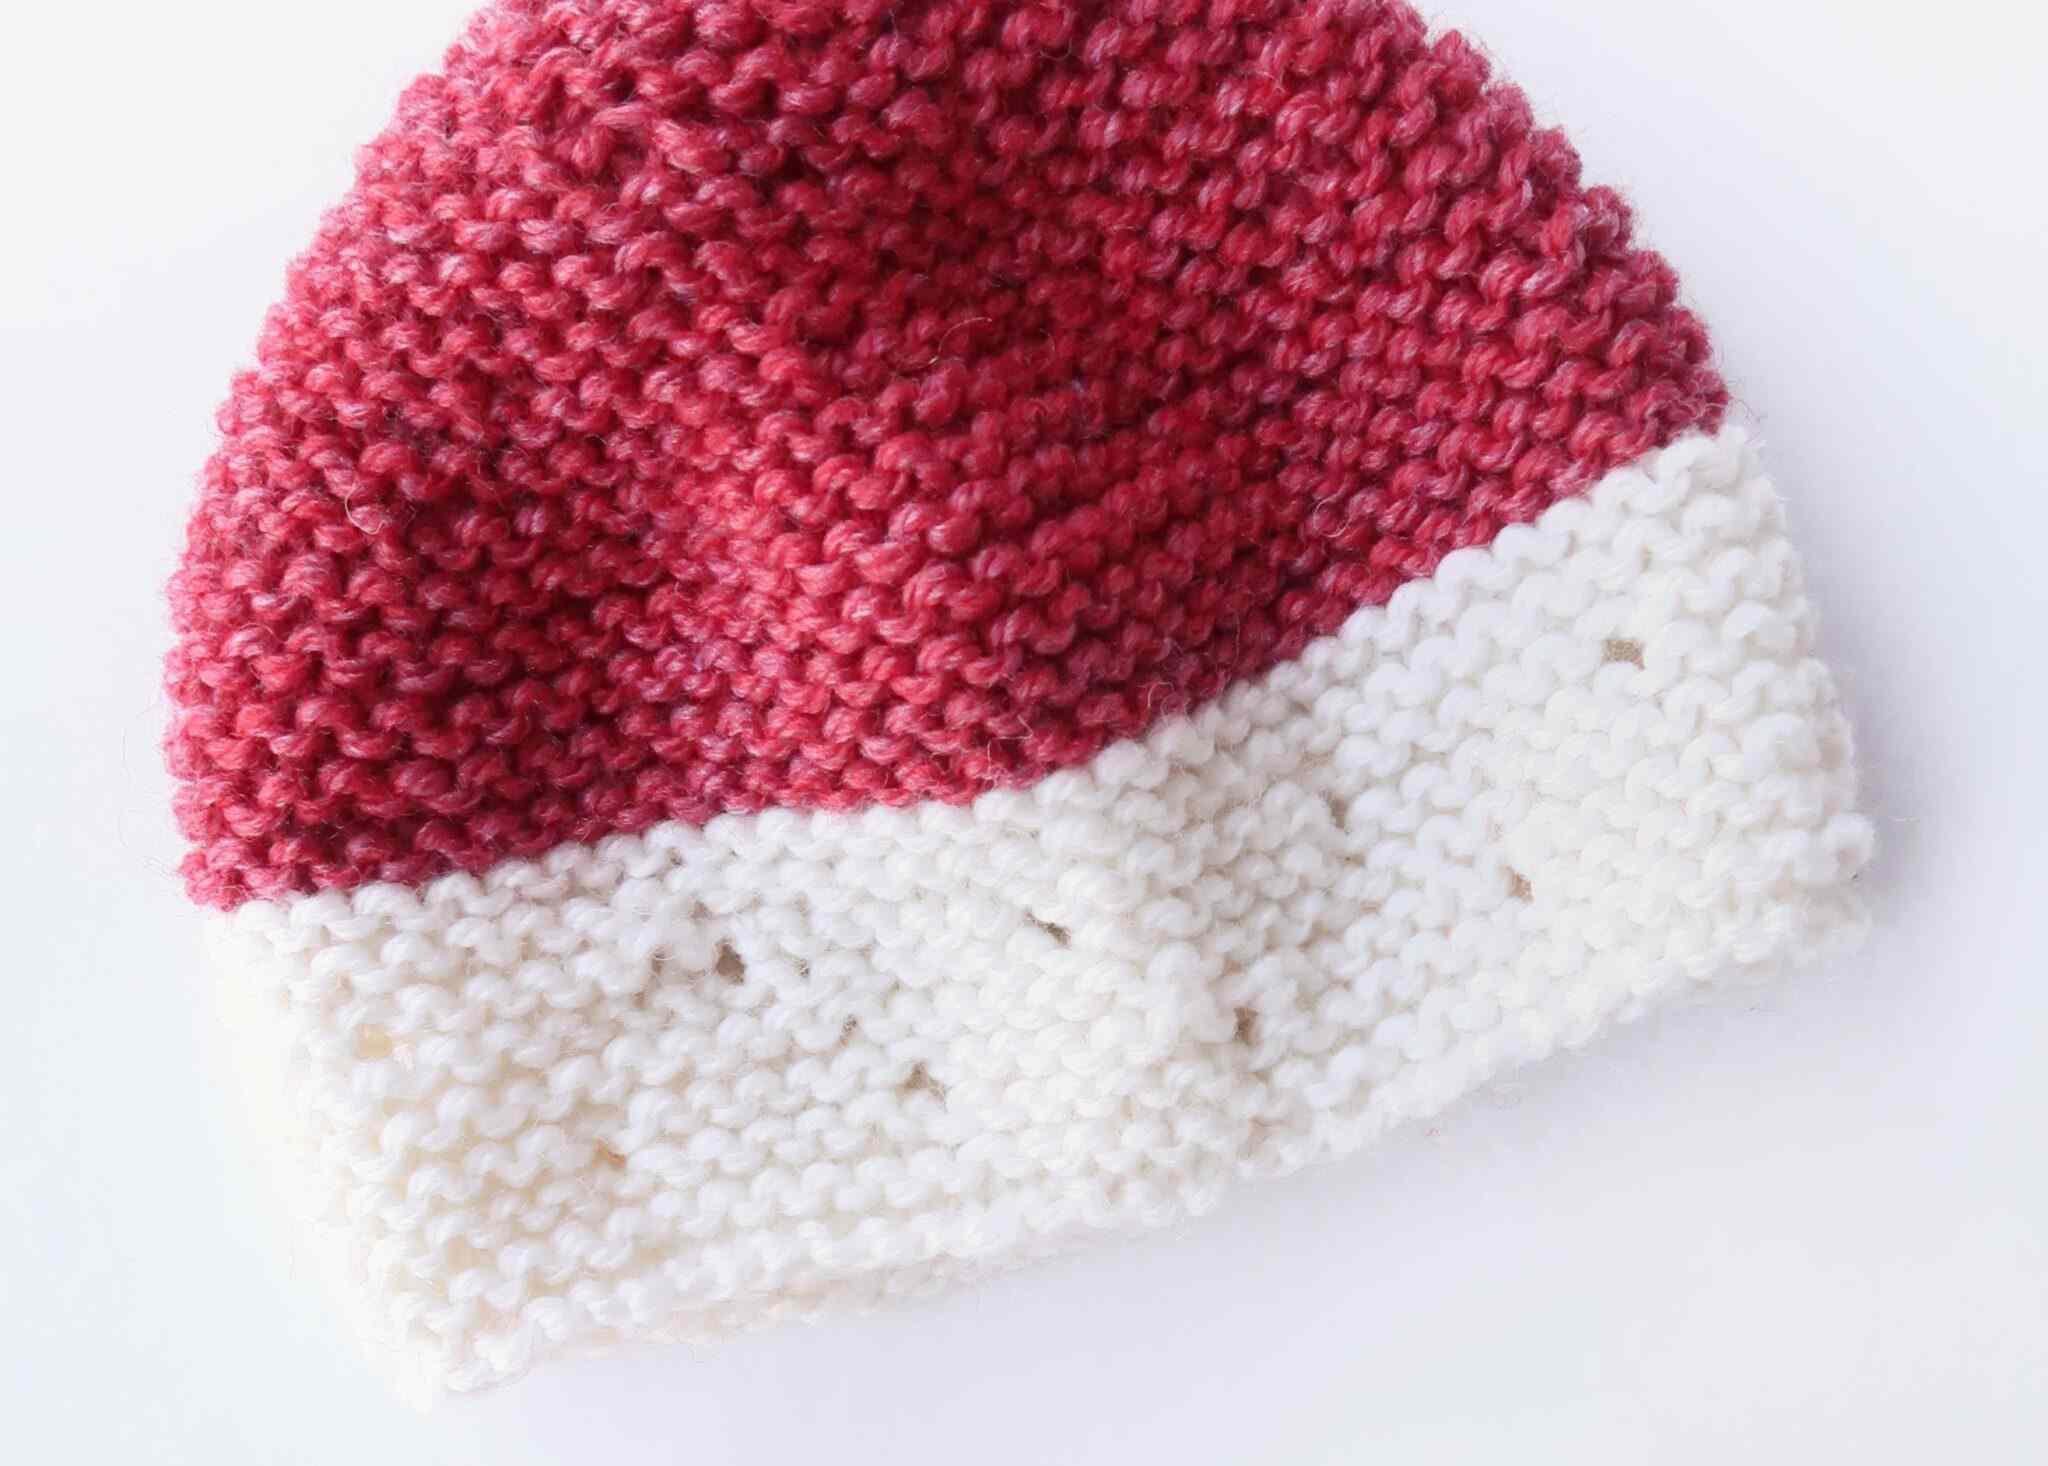 Strawberry Seeds Baby Hat Knitting Pattern